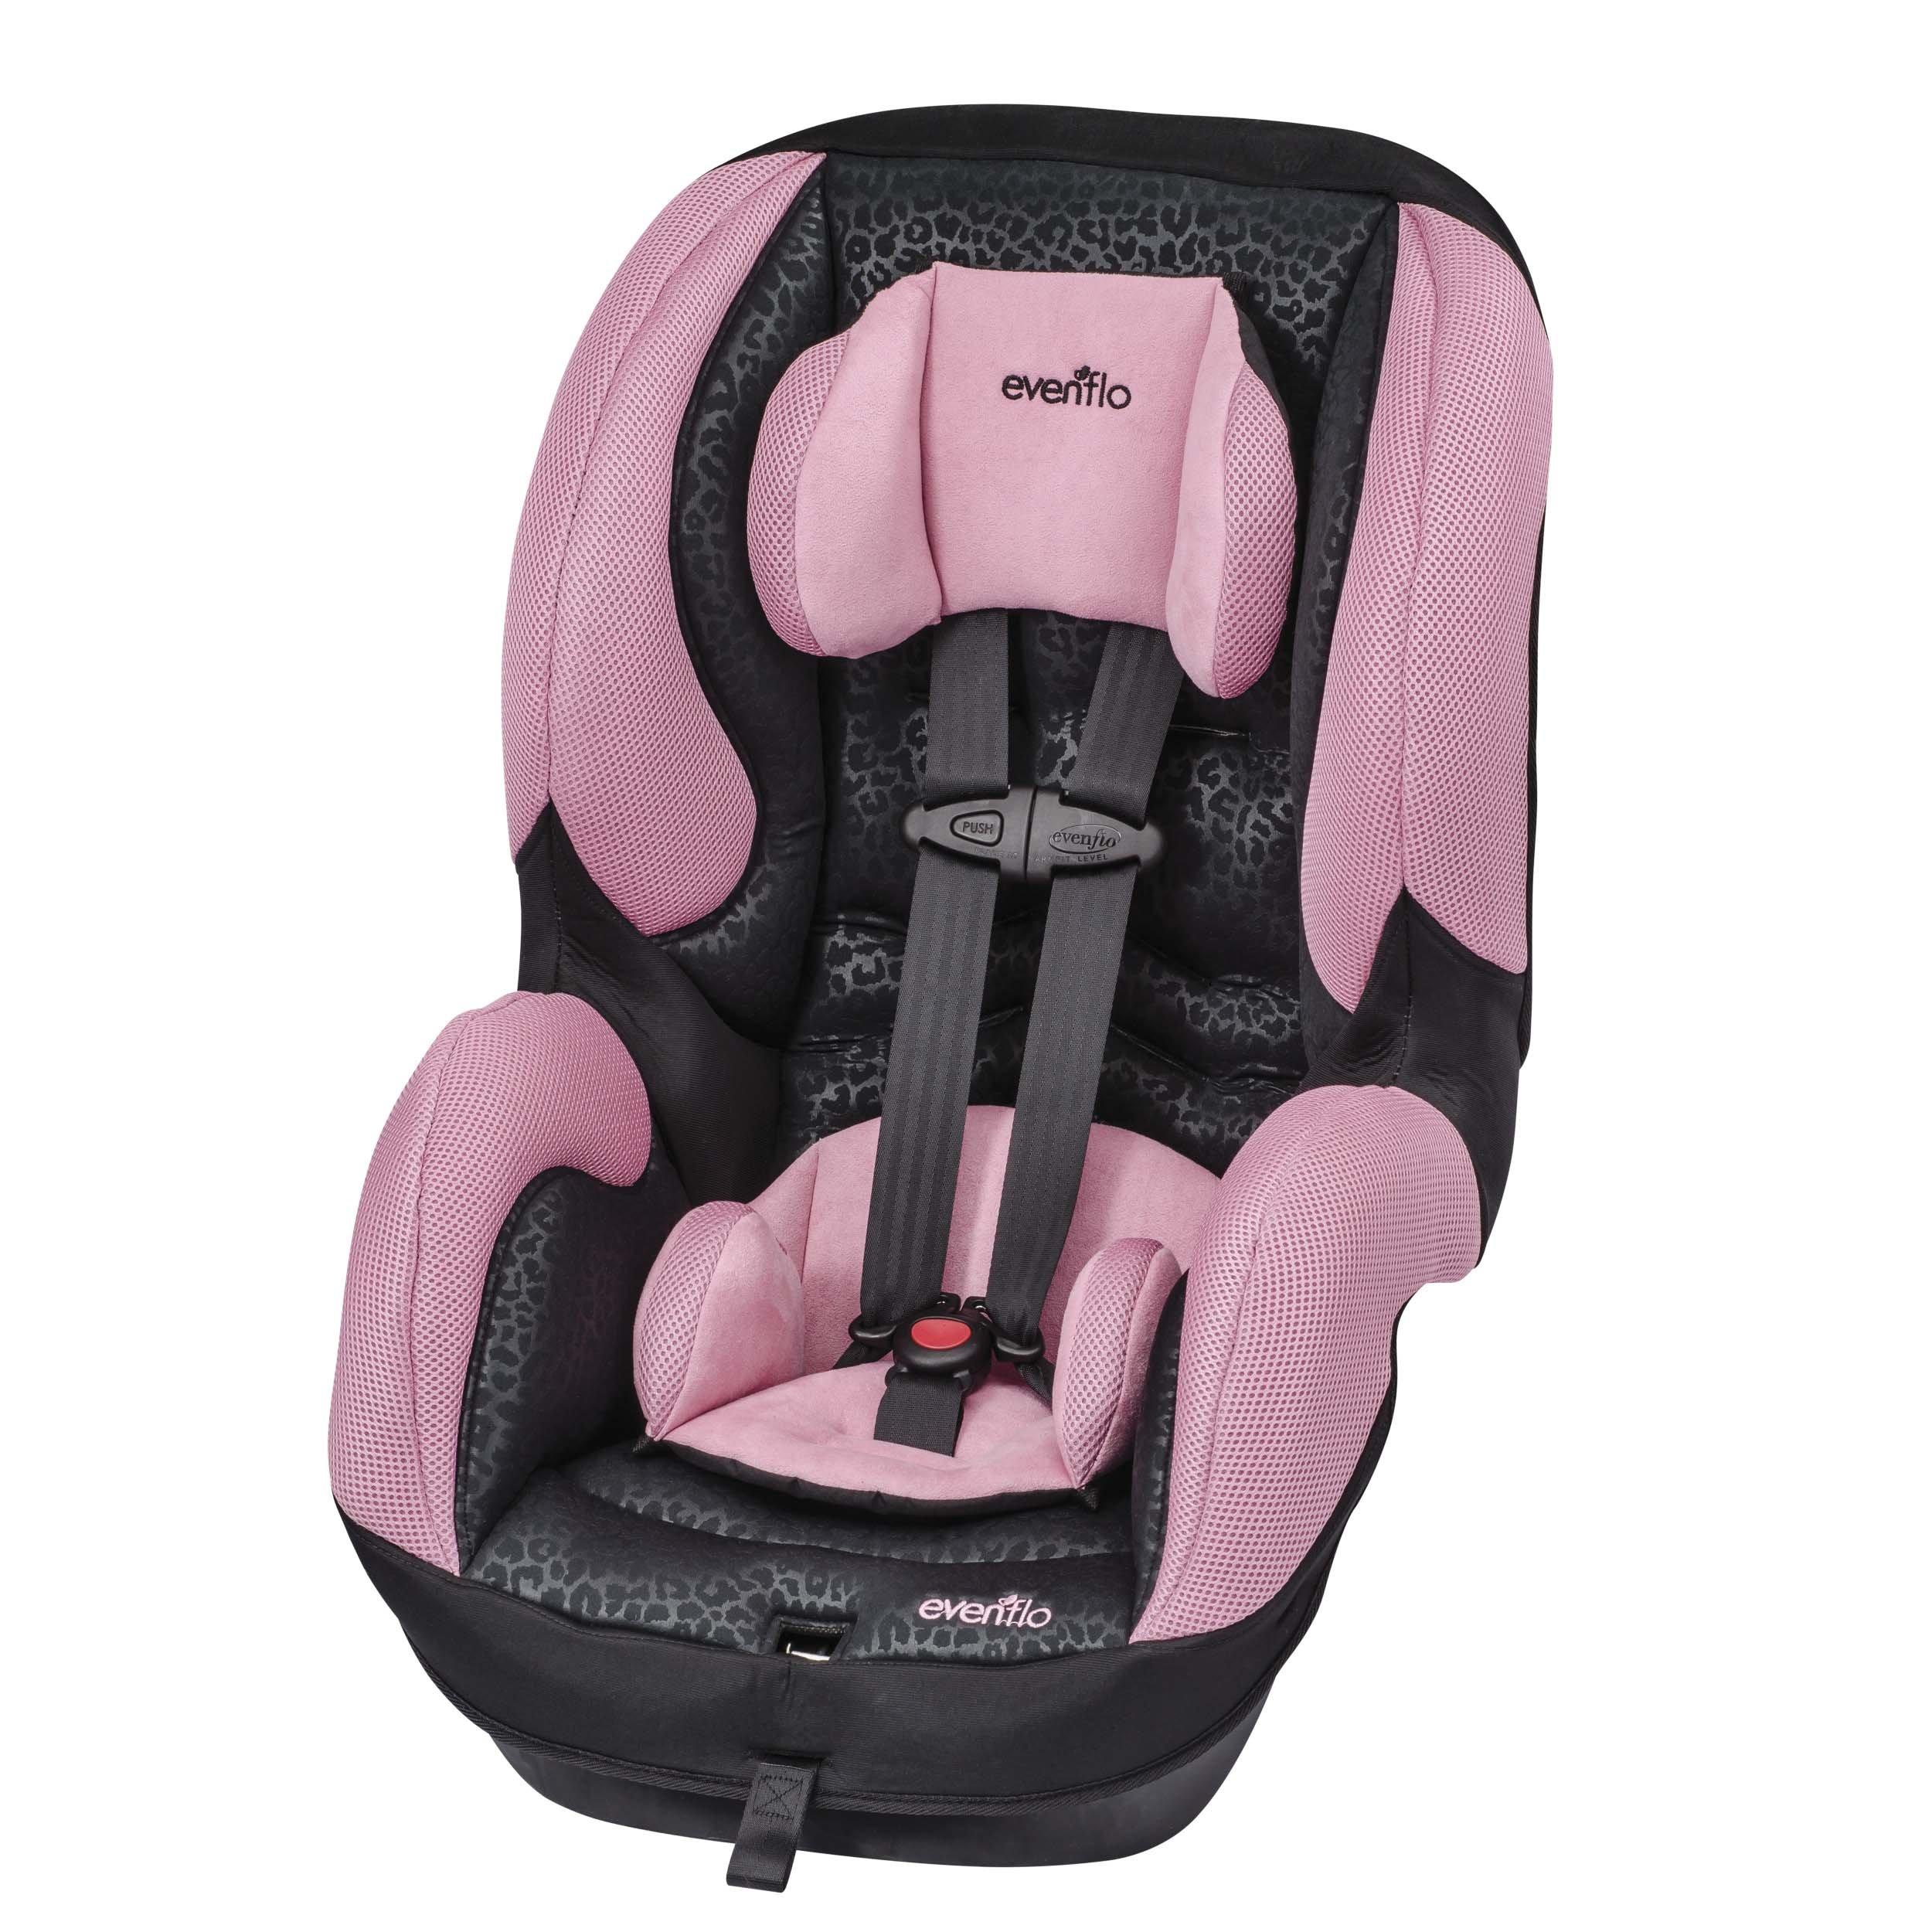 Evenflo SureRide 65 DLX Convertible Car Seat - Nicole